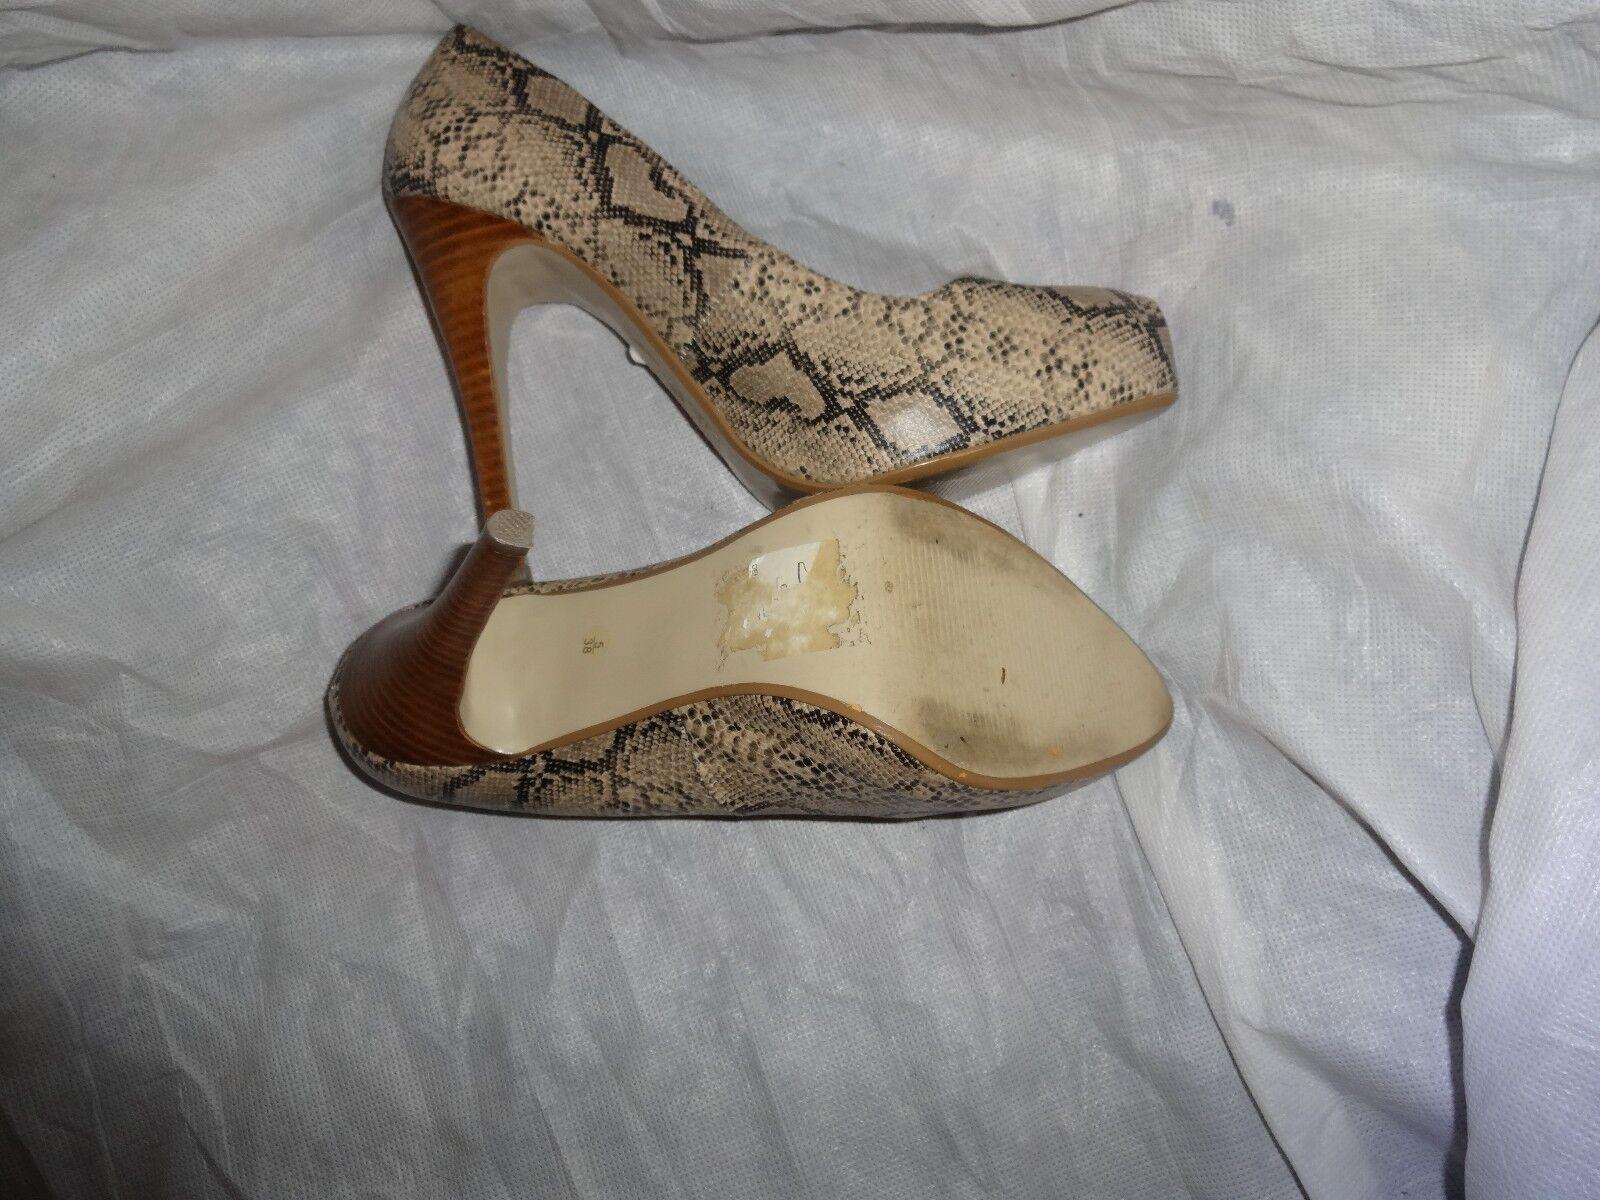 JASPER CONRAN WOMEN SNAKE LEATHER SIZE SLIP ON HEEL Schuhe SIZE LEATHER UK 5 EU 38 VGC 202726